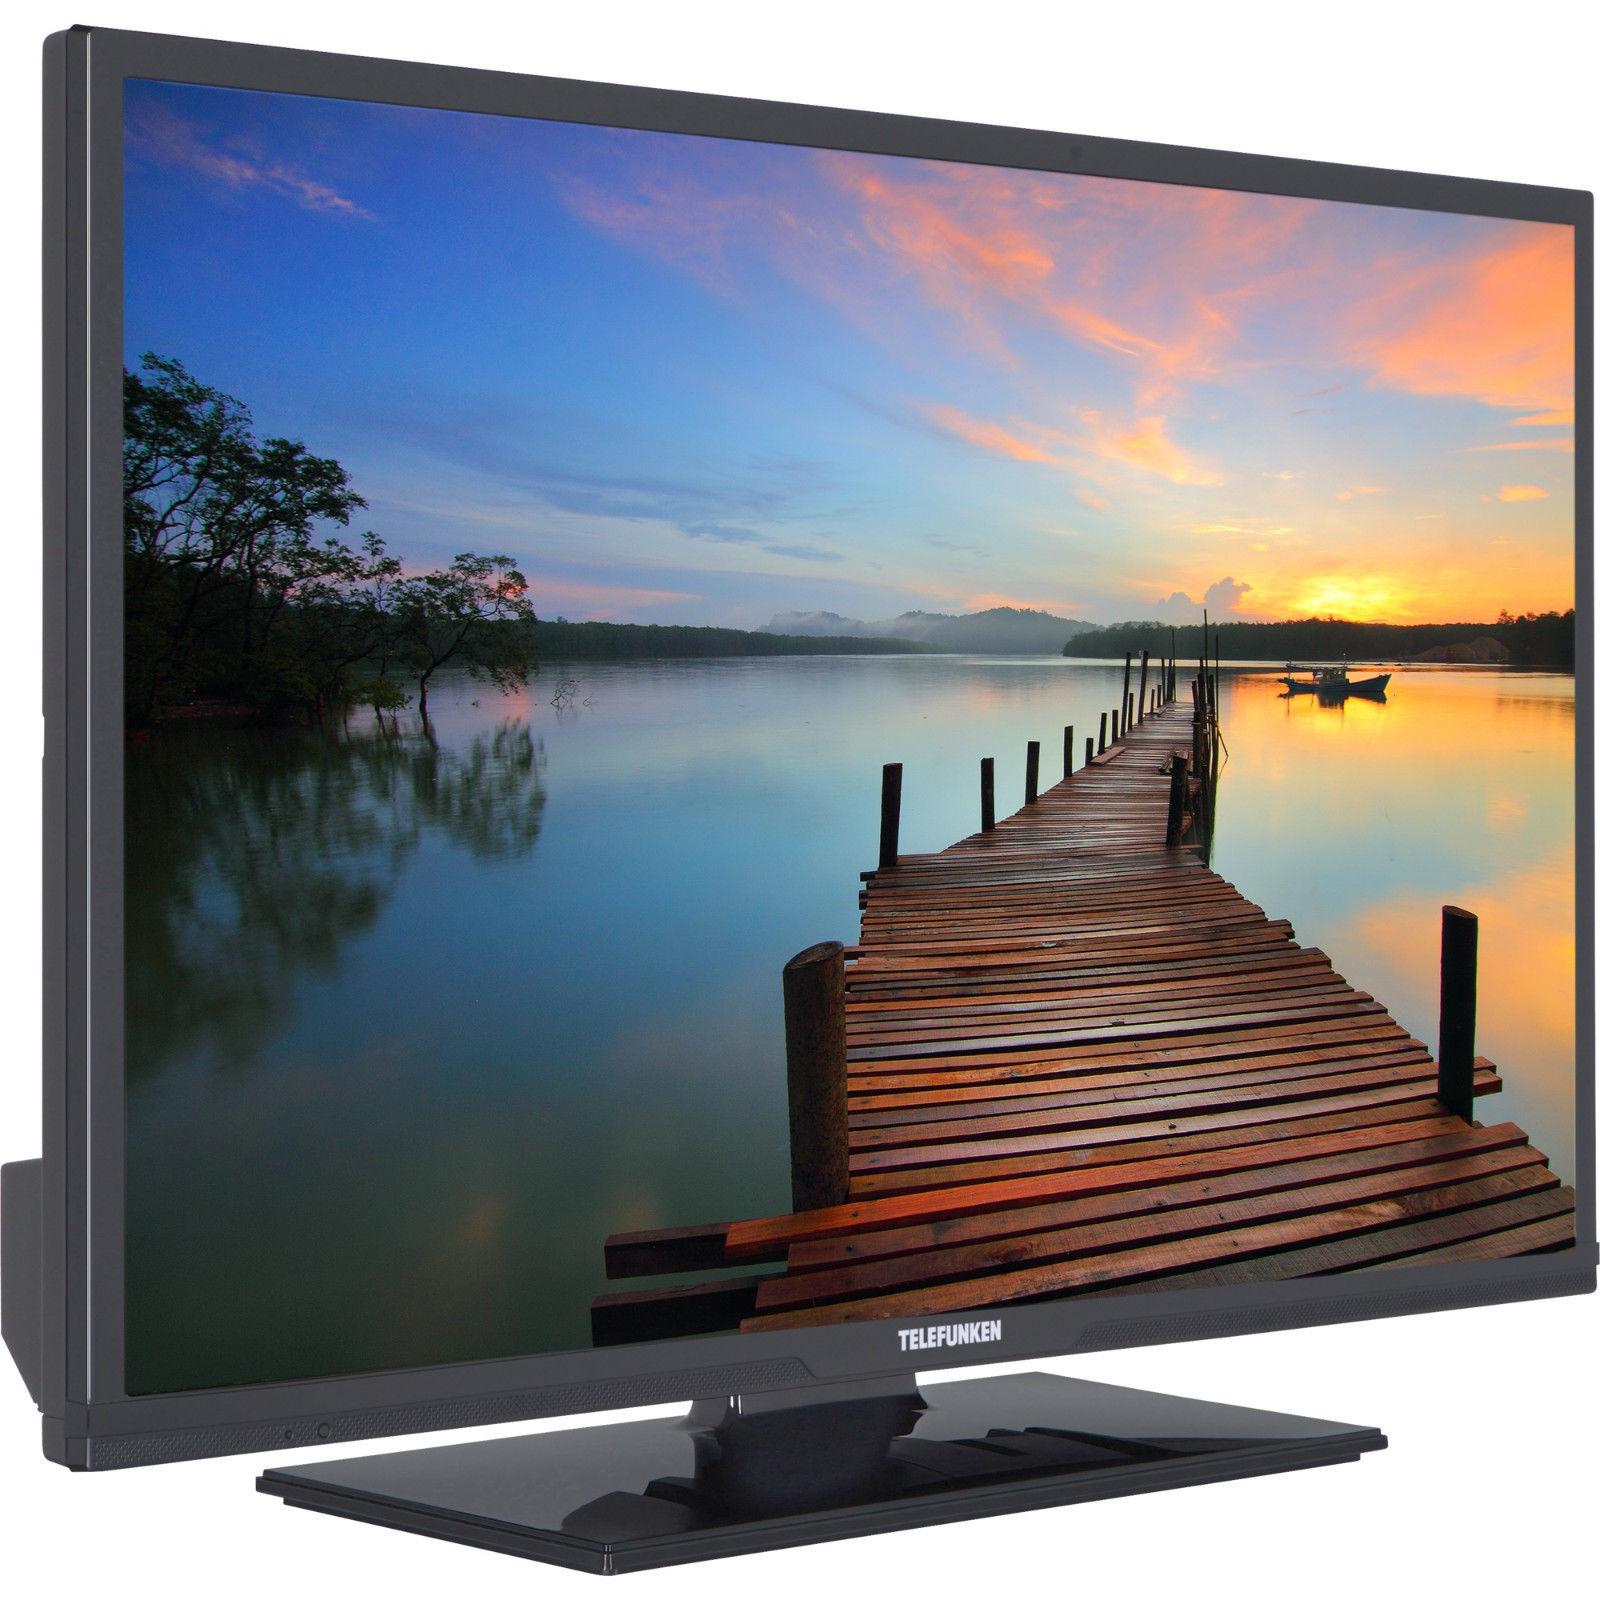 Telefunken D32F2518YRB 32 Zoll Full-HD Fernseher Triple Tuner